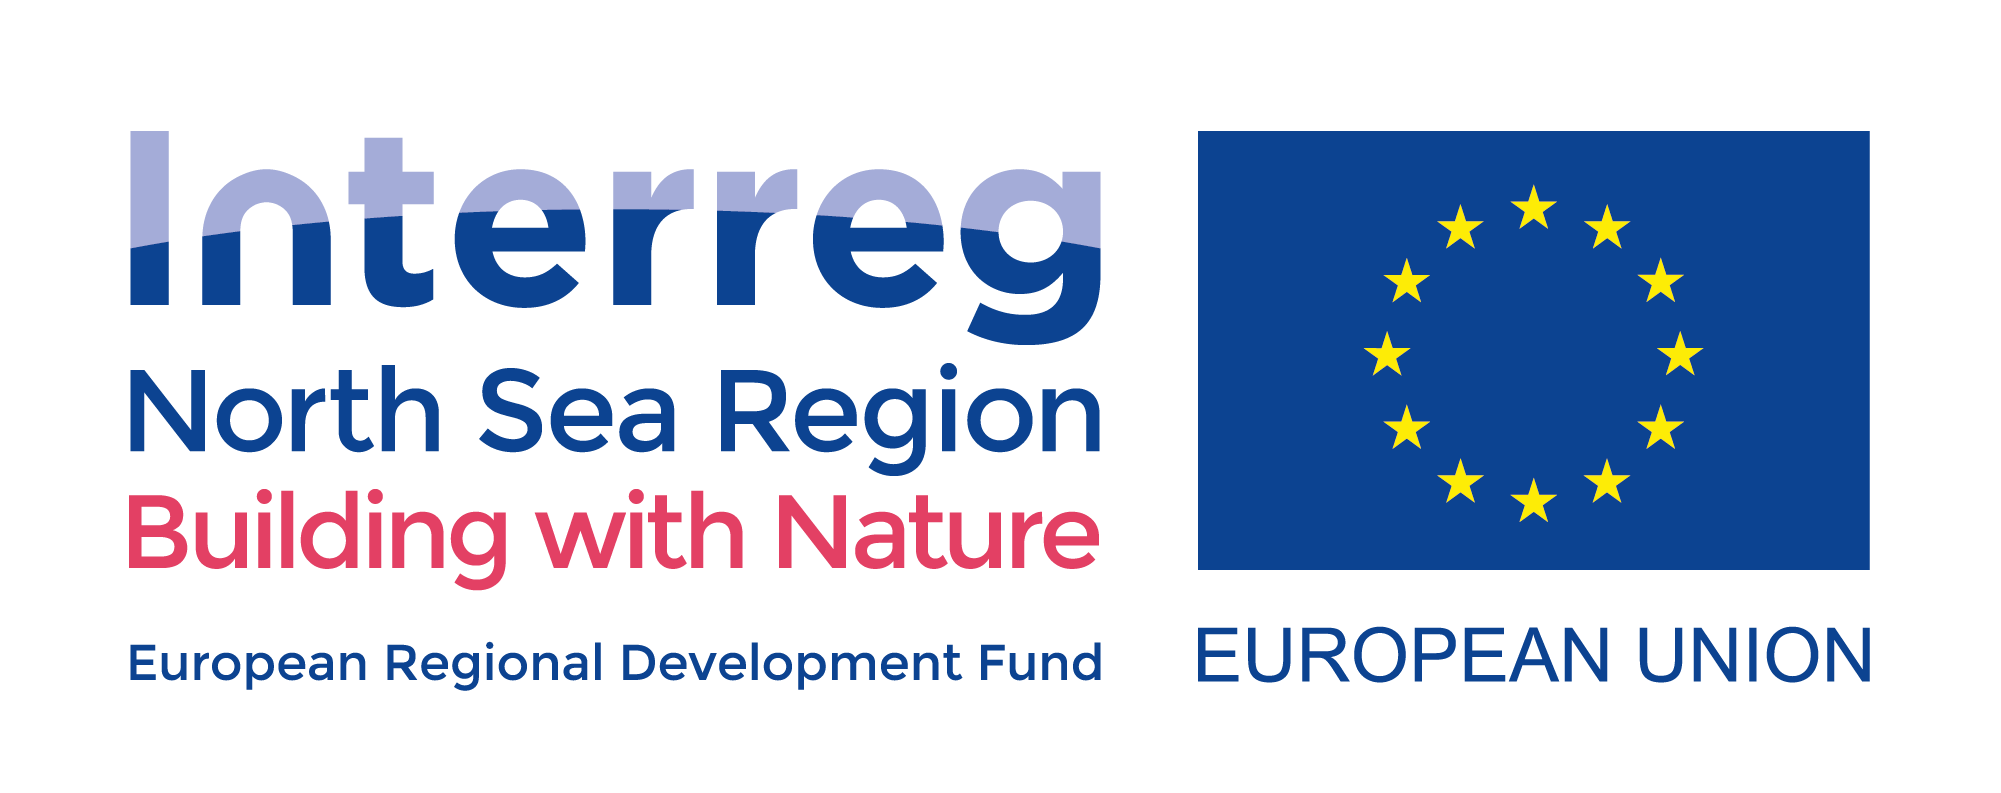 Interreg North Sea Region